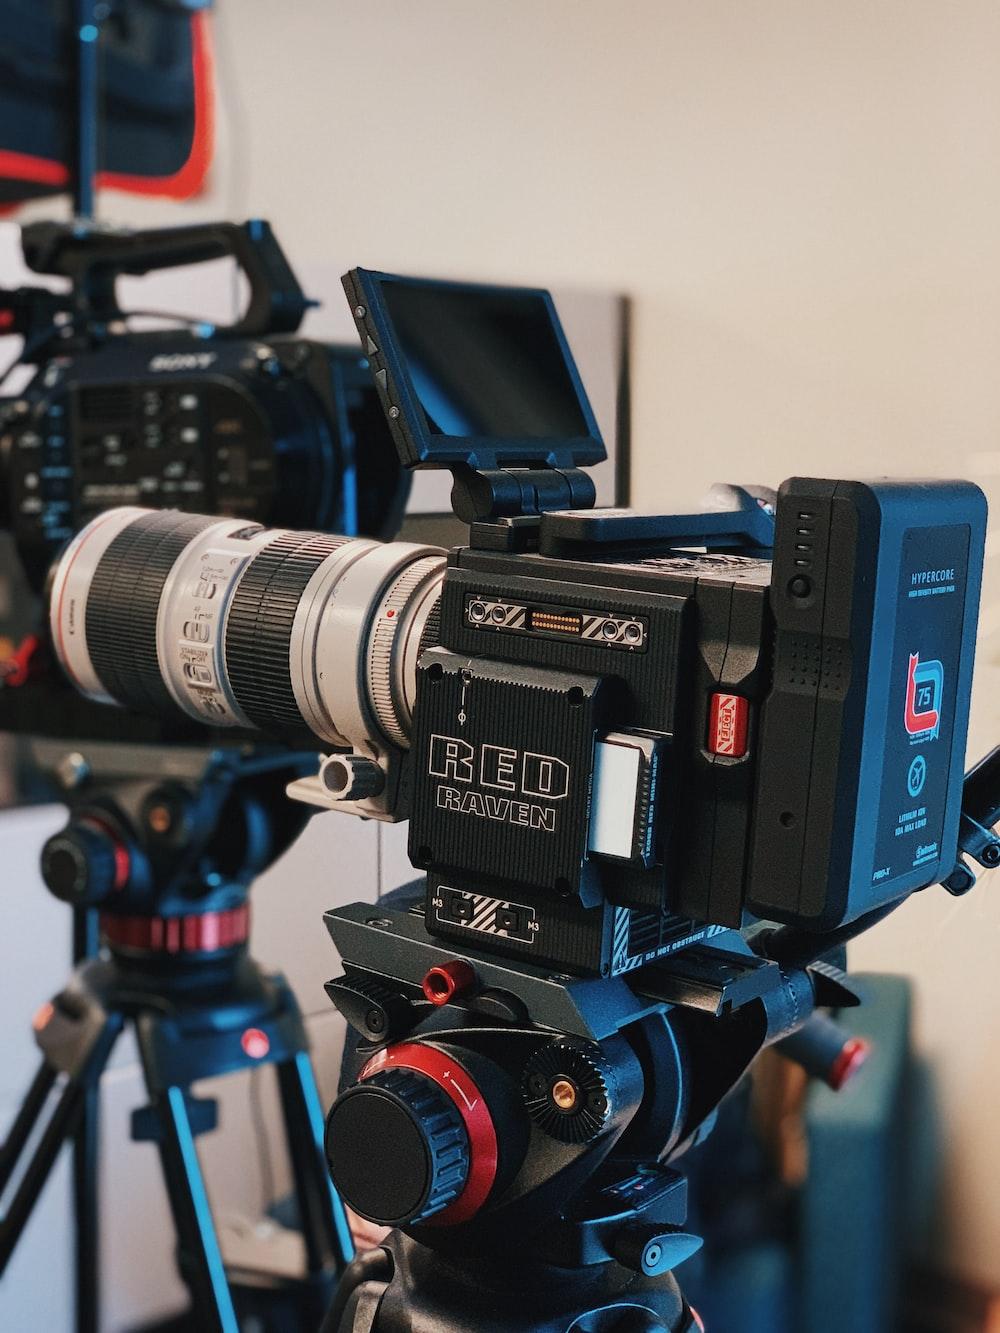 black and red camera tripod